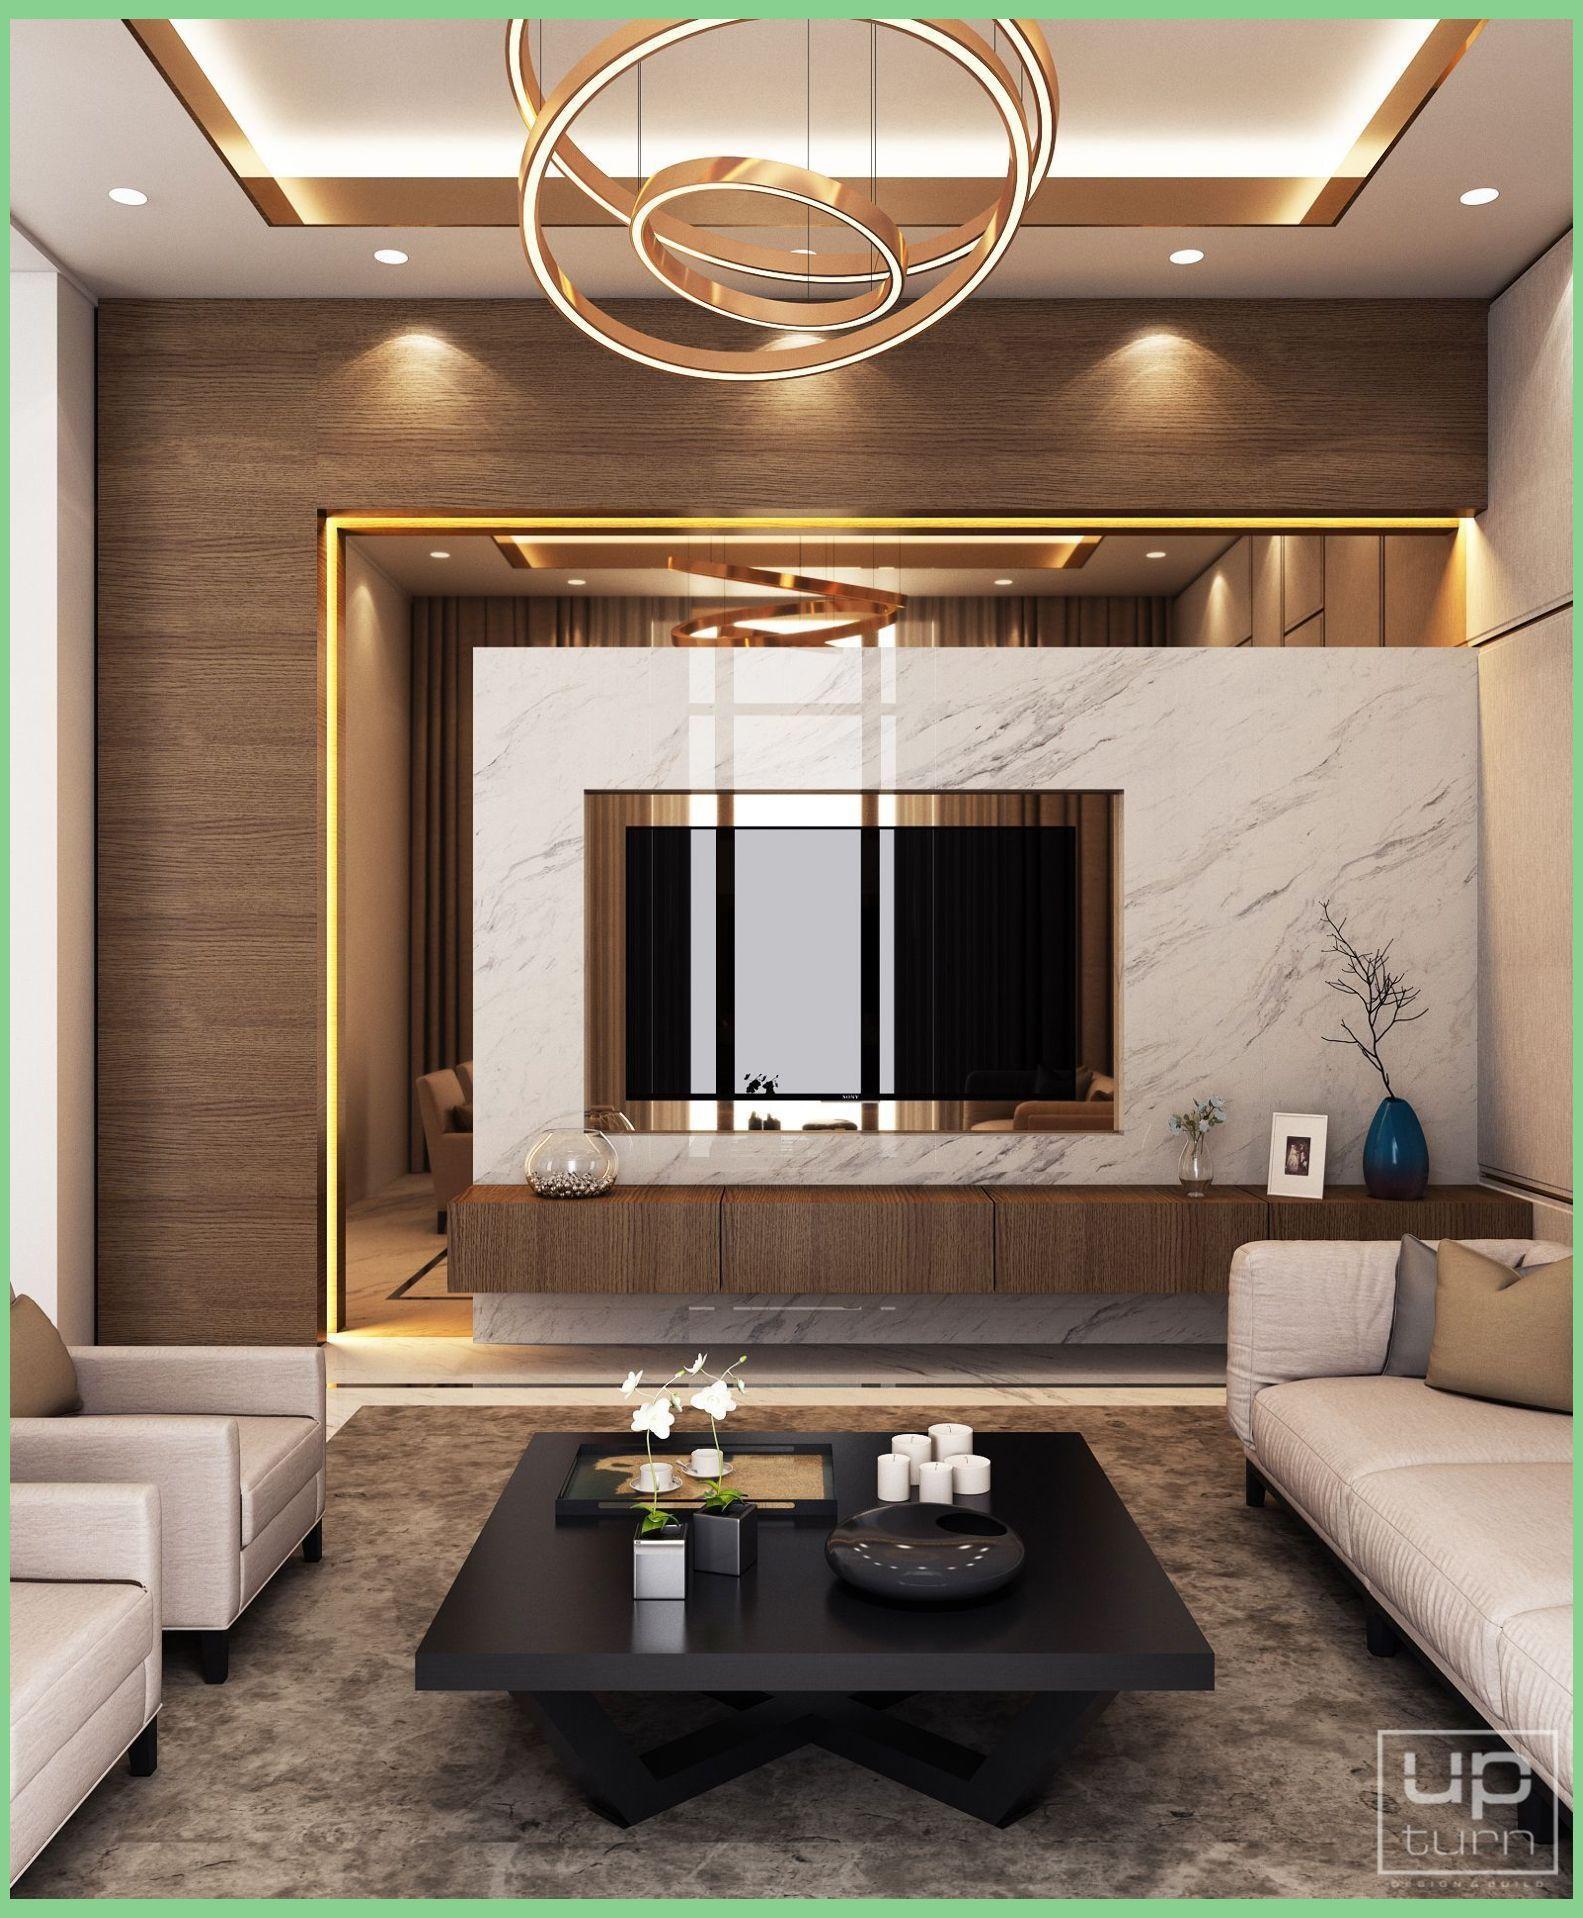 Luxury Home Renovation Ideas In Budget Dyi Home Renovations Living Room Design Modern Living Room Tv Unit Designs Luxury Interior Design